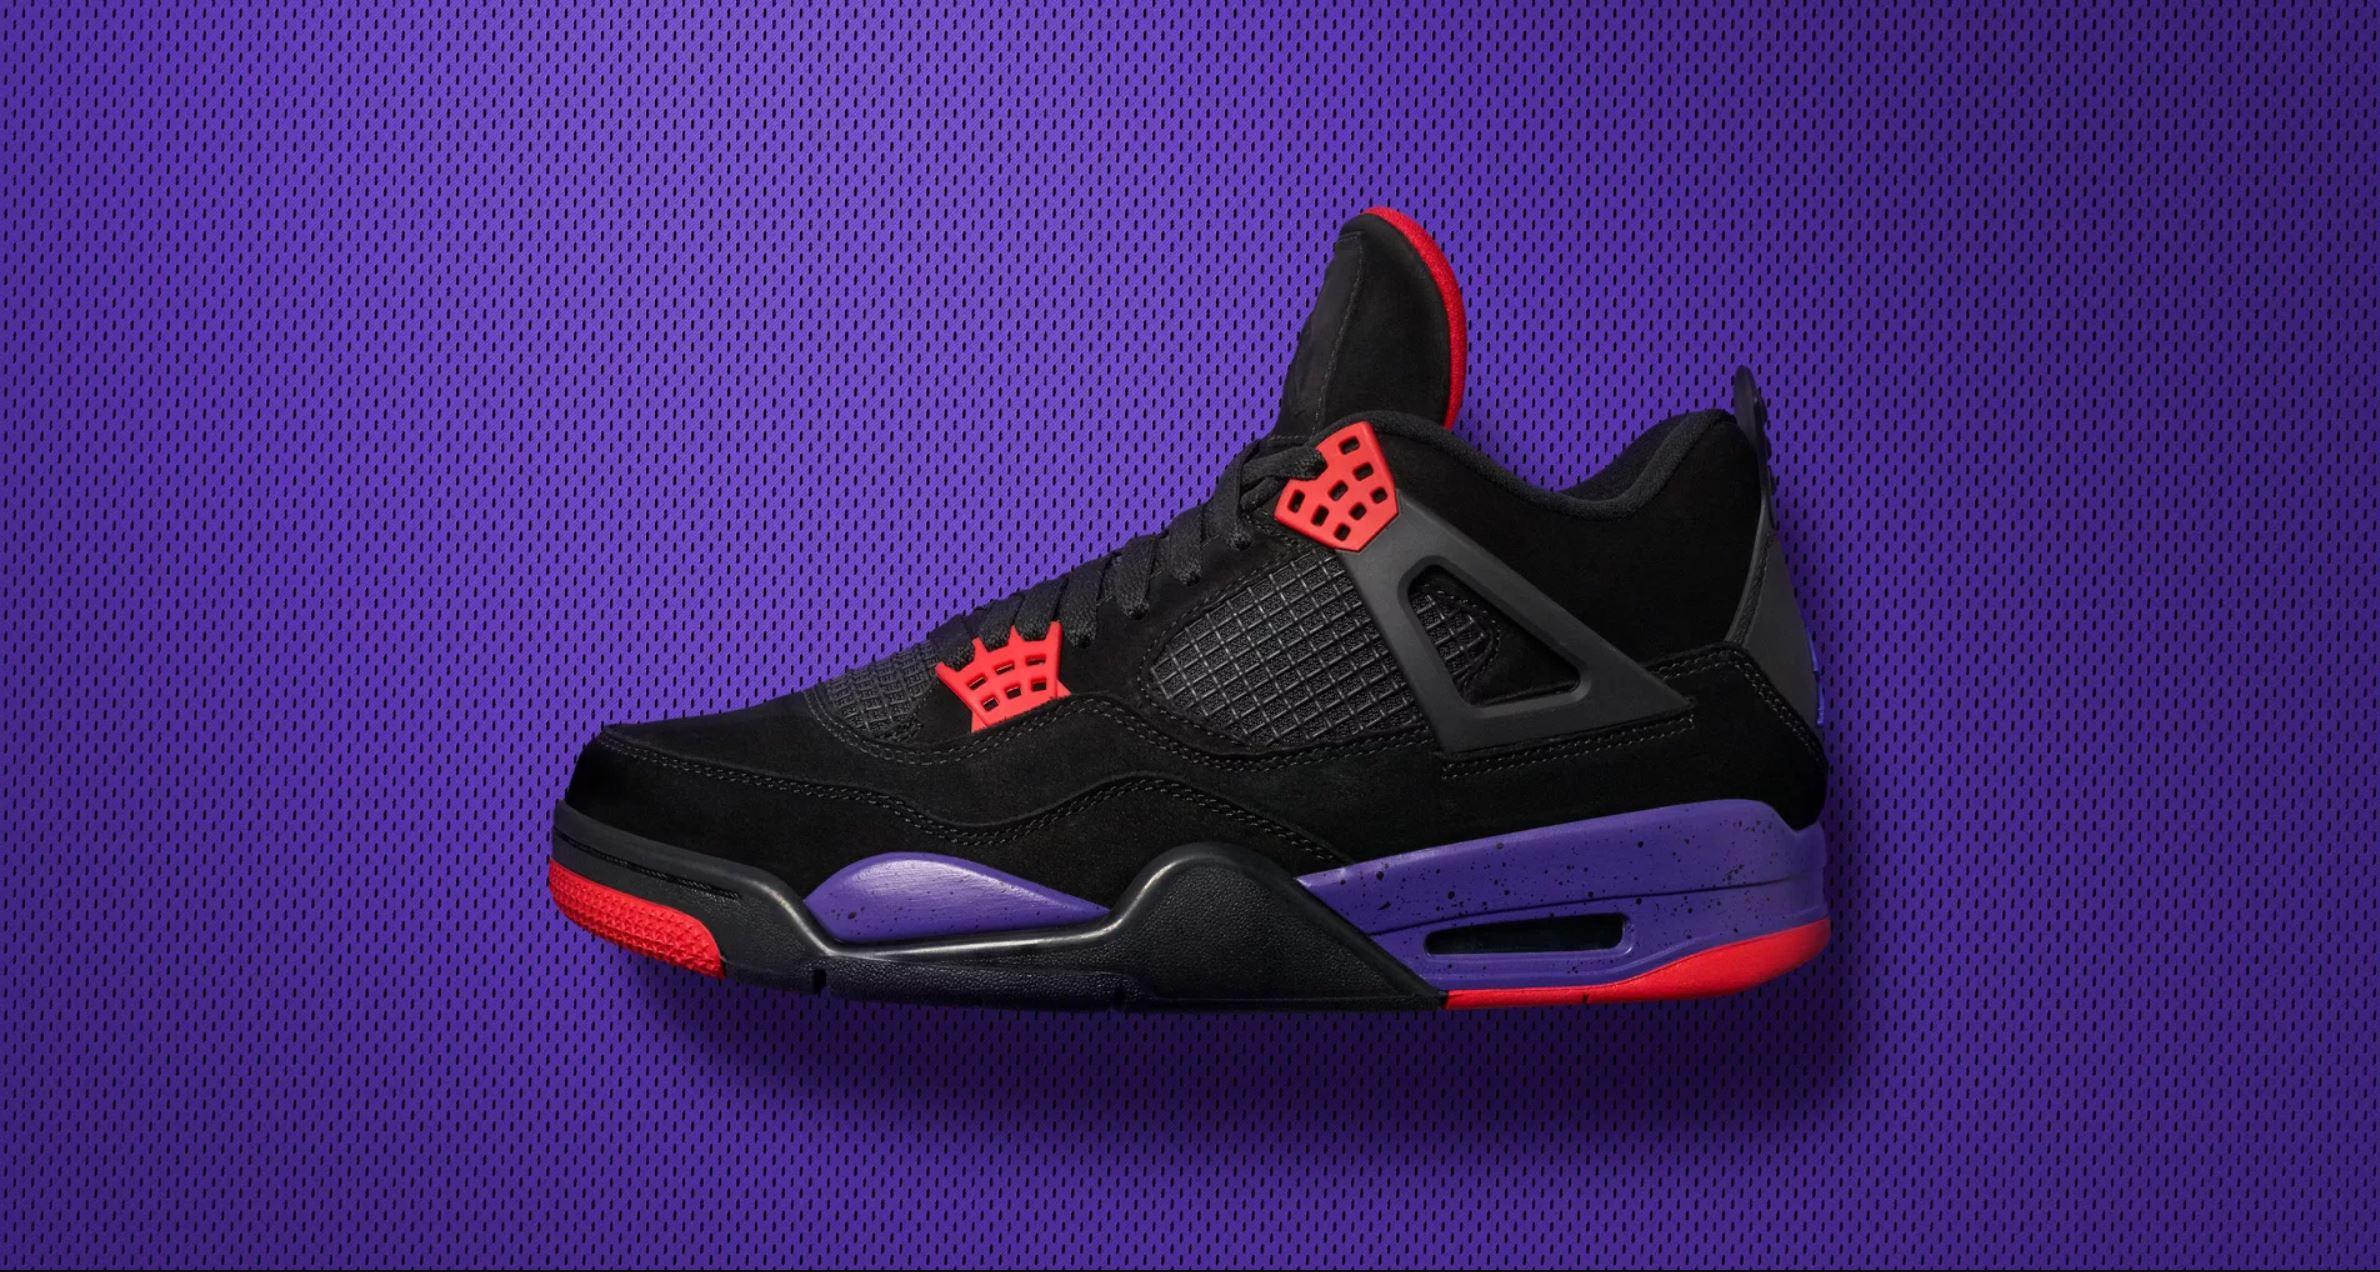 The Air Jordan 4 'Black/Court Purple